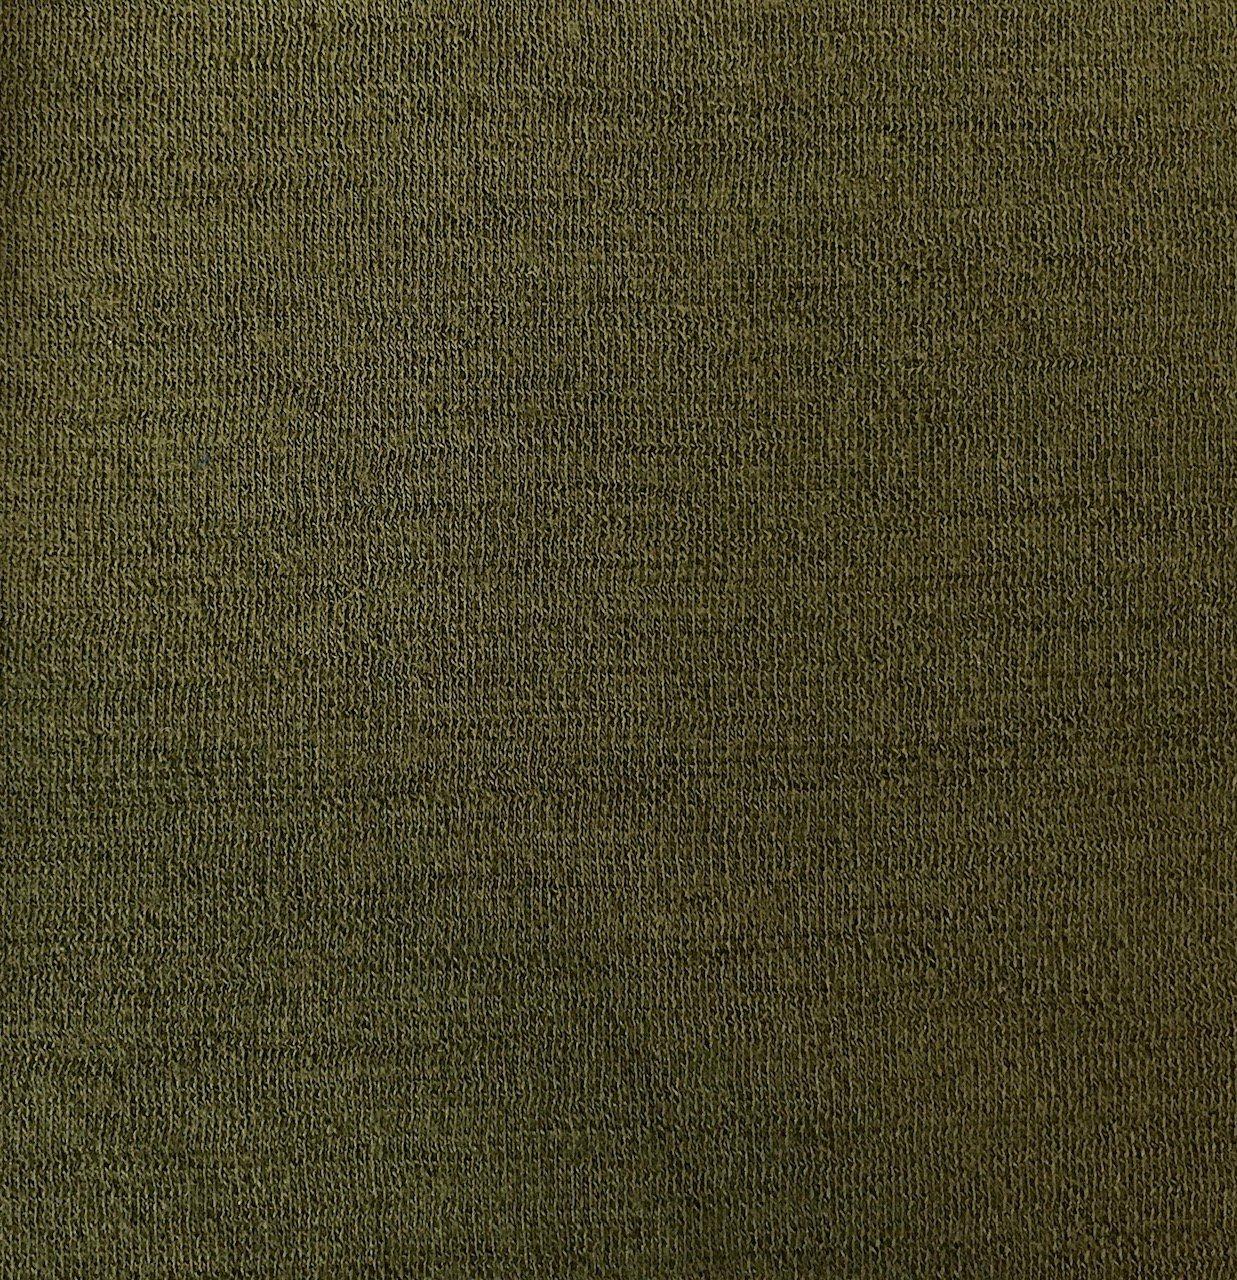 Merino Wool/Viscose - Olive